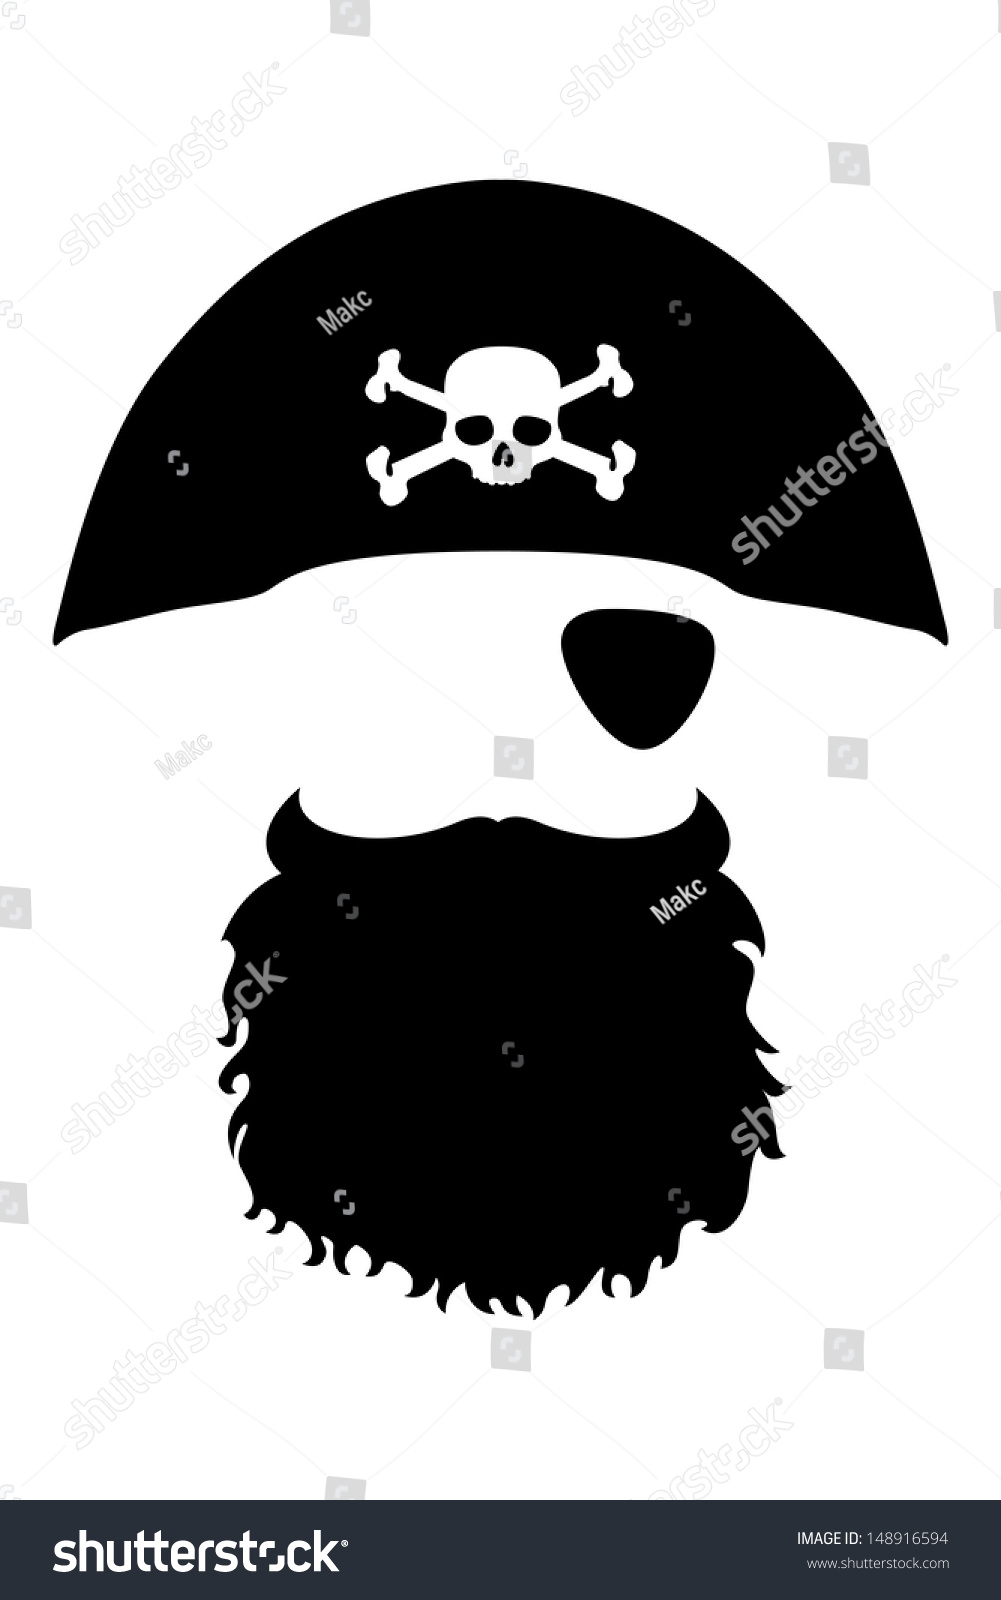 Image gallery for : beard outline tem